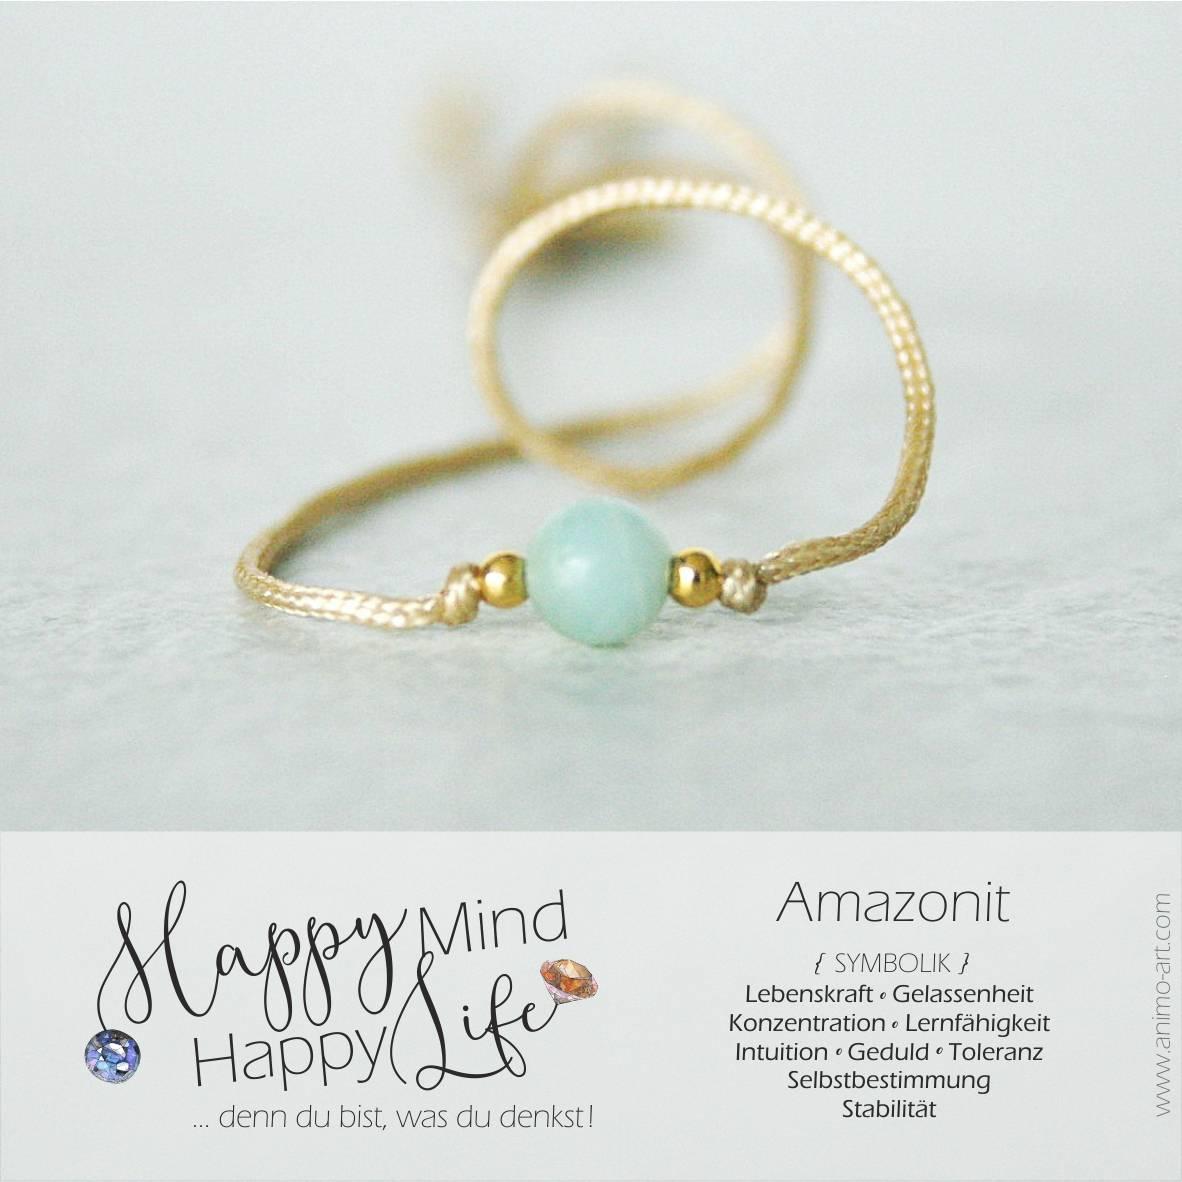 Amazonit Bedeutung, Schmuck mit Amazonit-Armband in blau, hellblau, , Happy Mind Happy Life